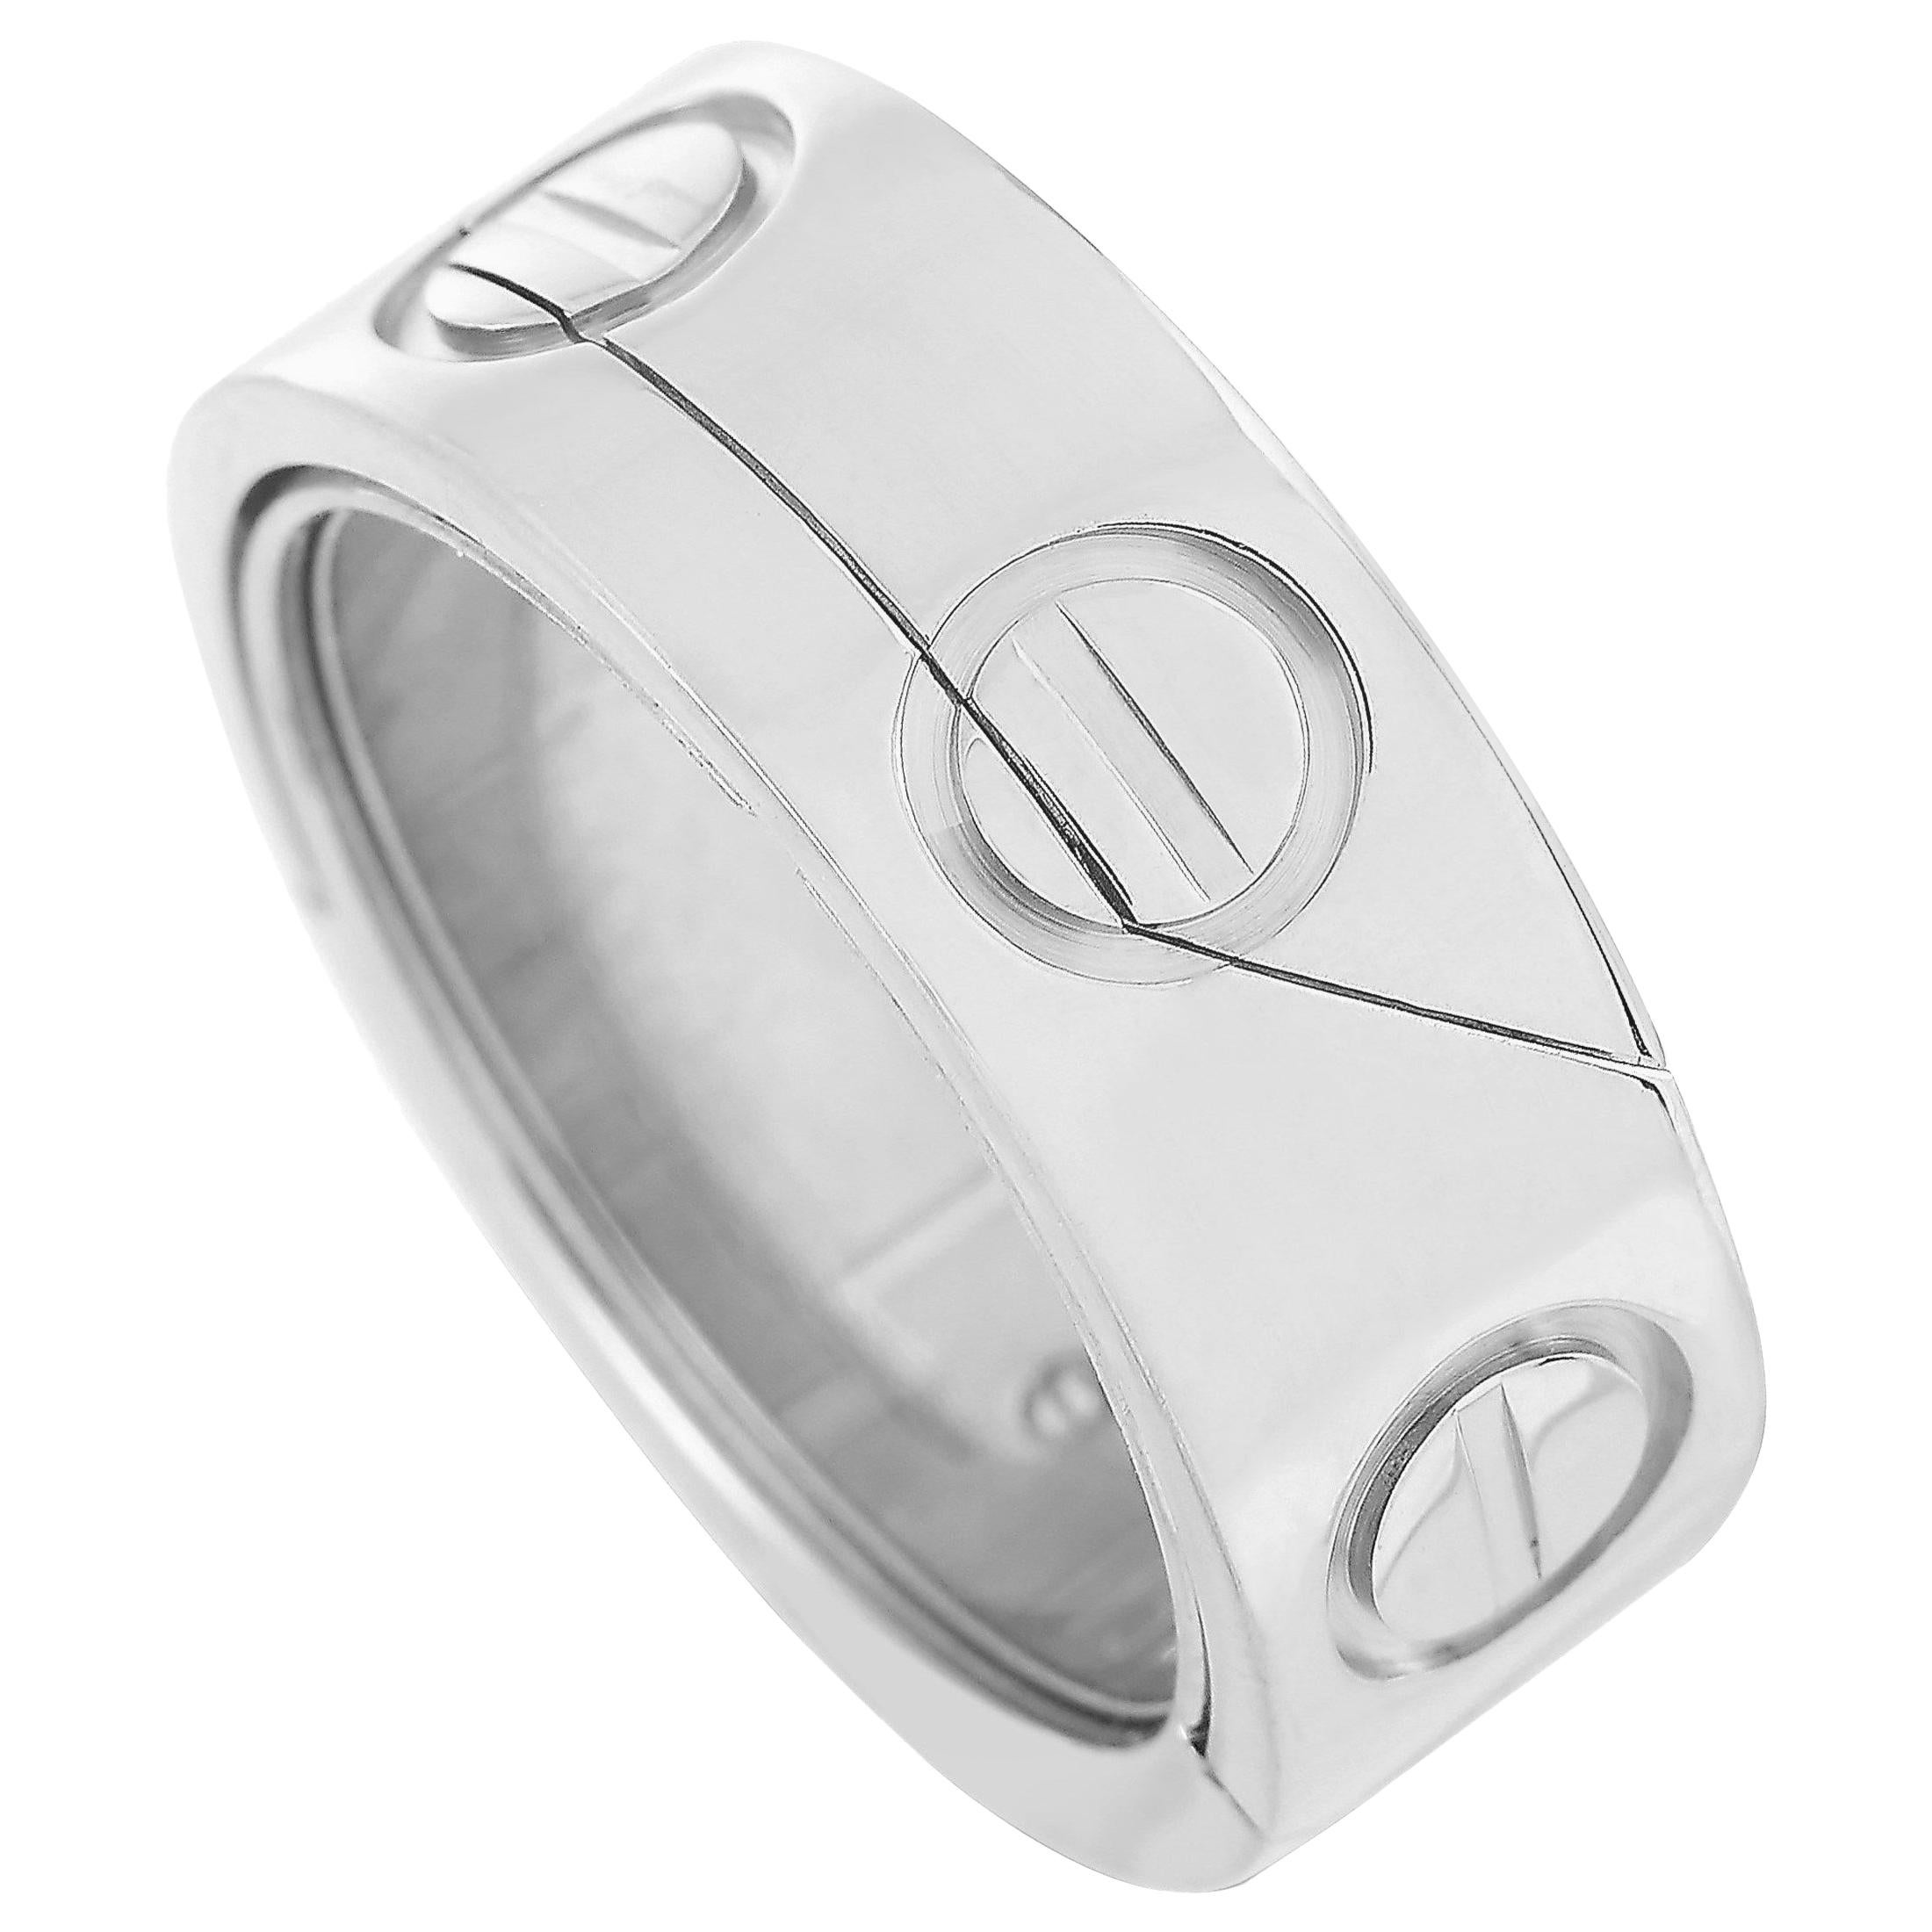 Cartier Astro LOVE 18 Karat White Gold Ring